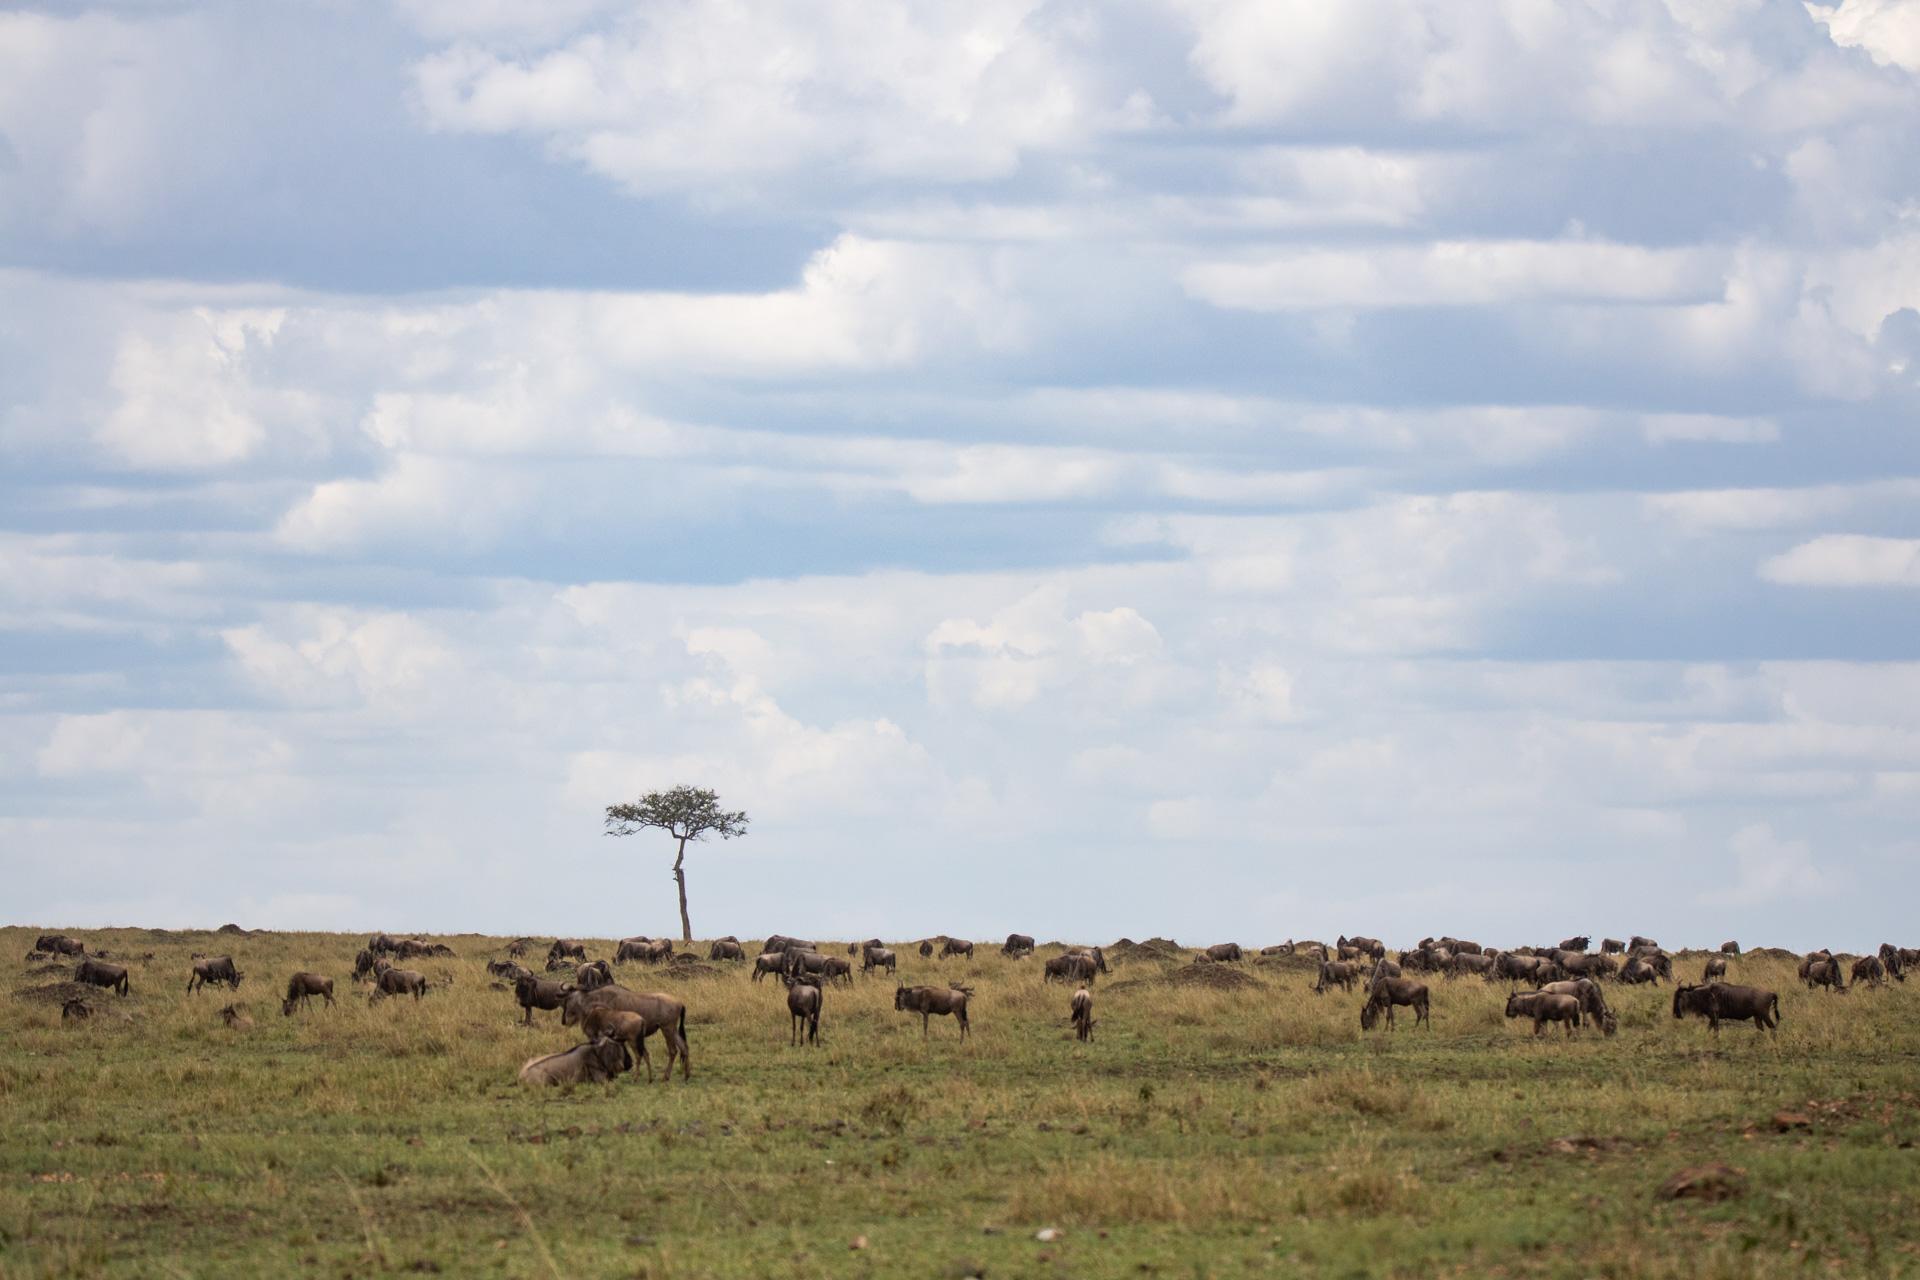 More wildebeest